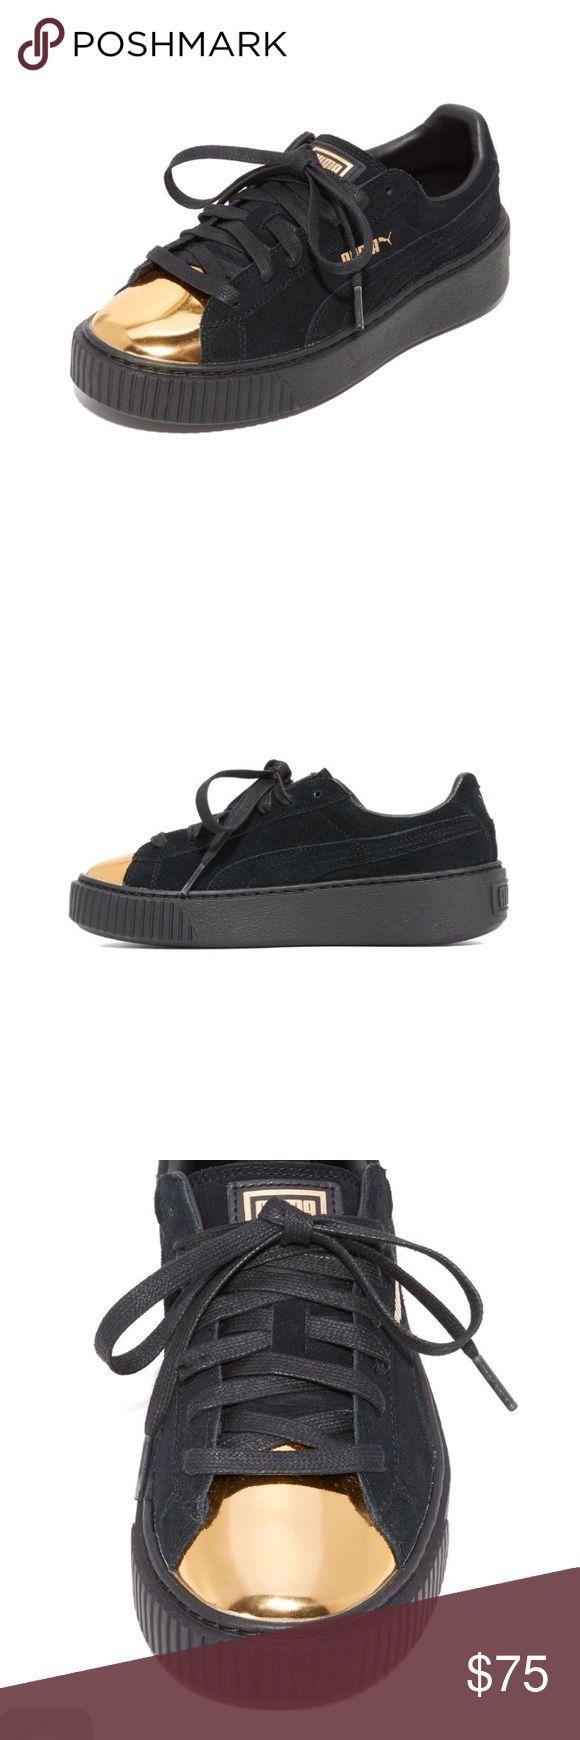 Puma Creeper Sneaker Its 2016 puma creeper. Its barely used. Puma Shoes Sneakers